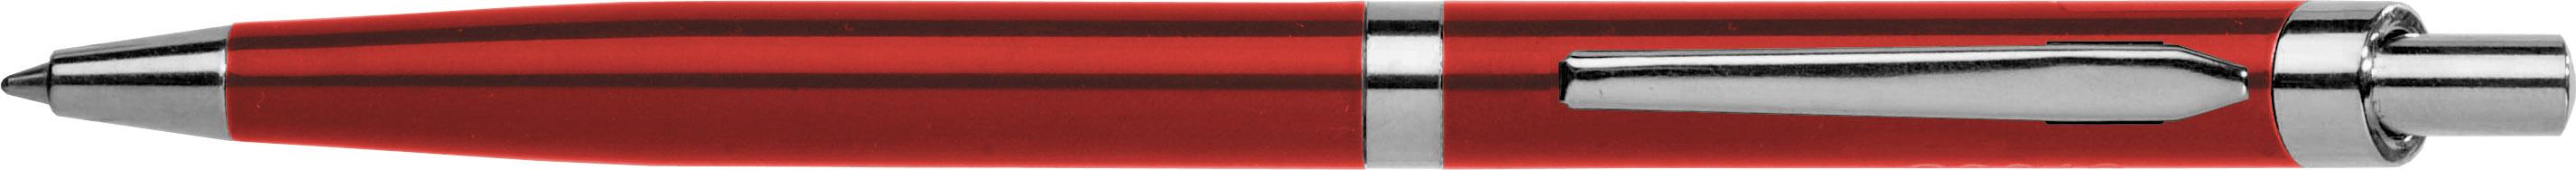 Ручка подар. EK Incanto NT-120 автомат, корпус красн с желт метал.